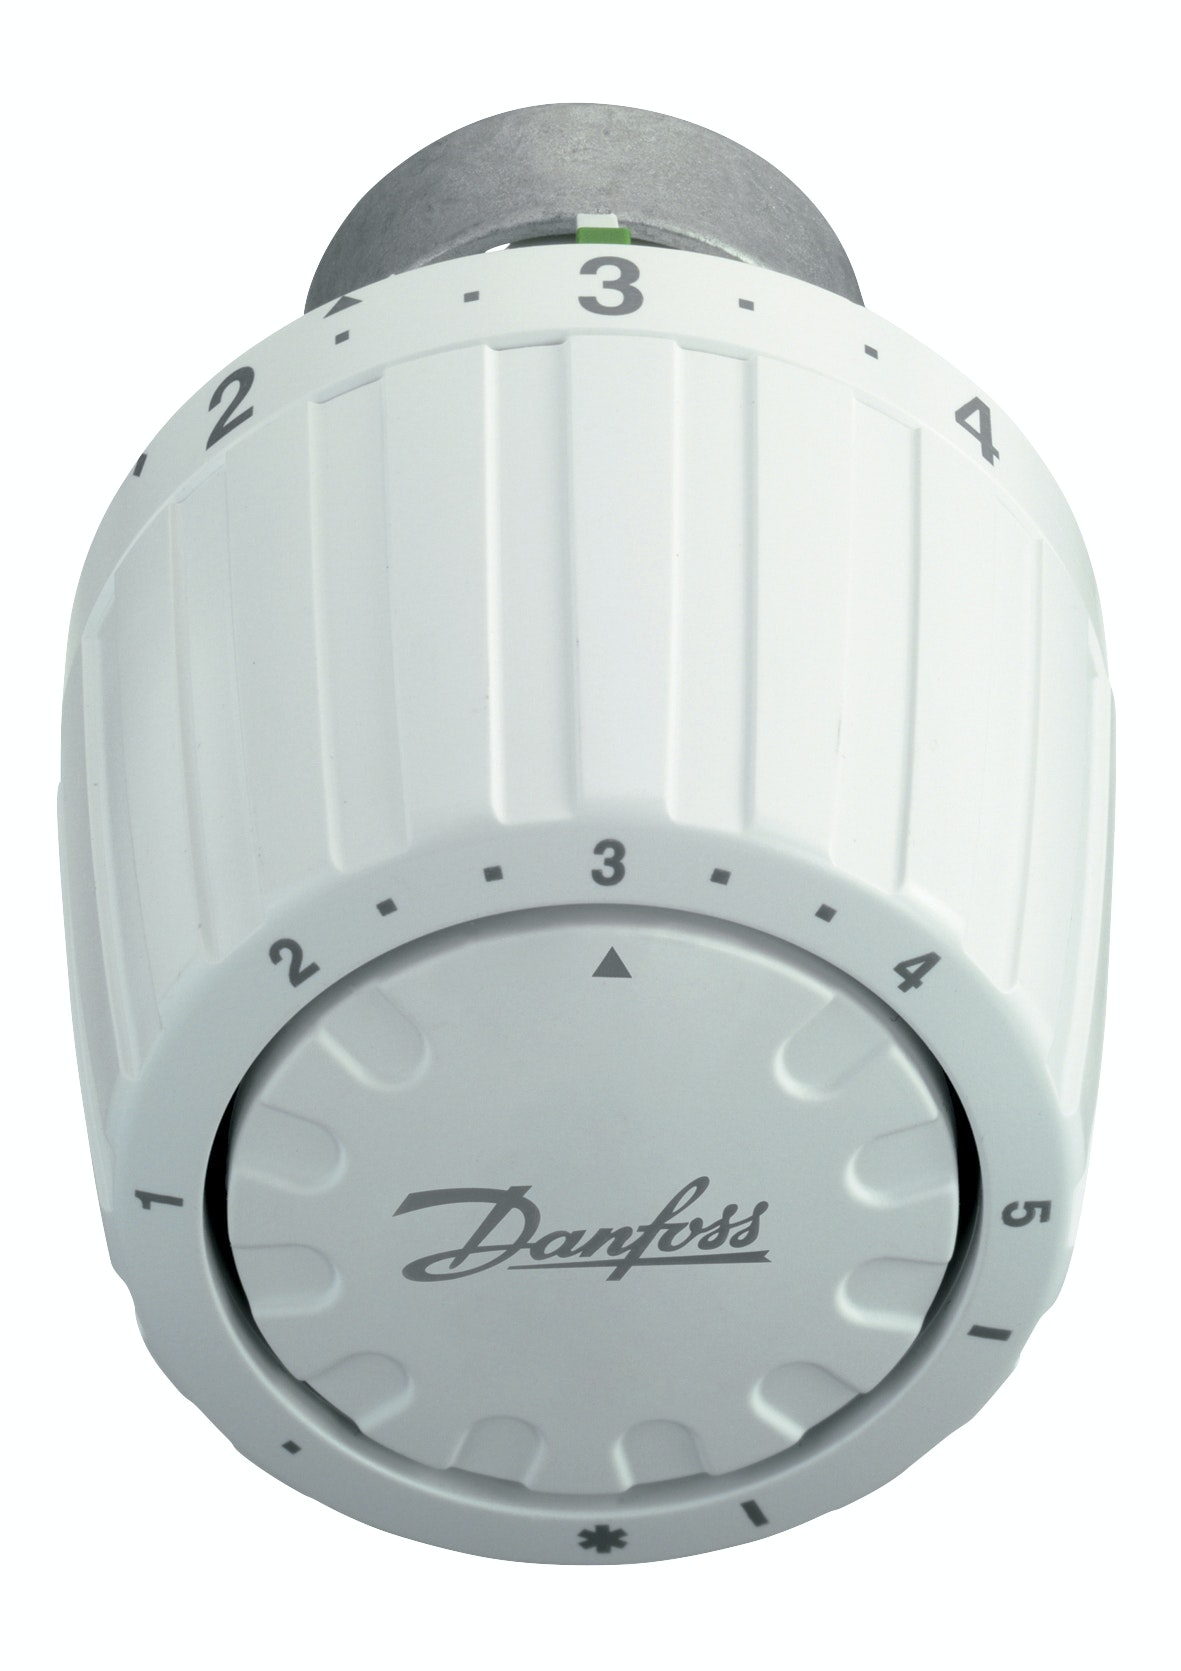 Regulatordel Danfoss Ra 2950 7-28°